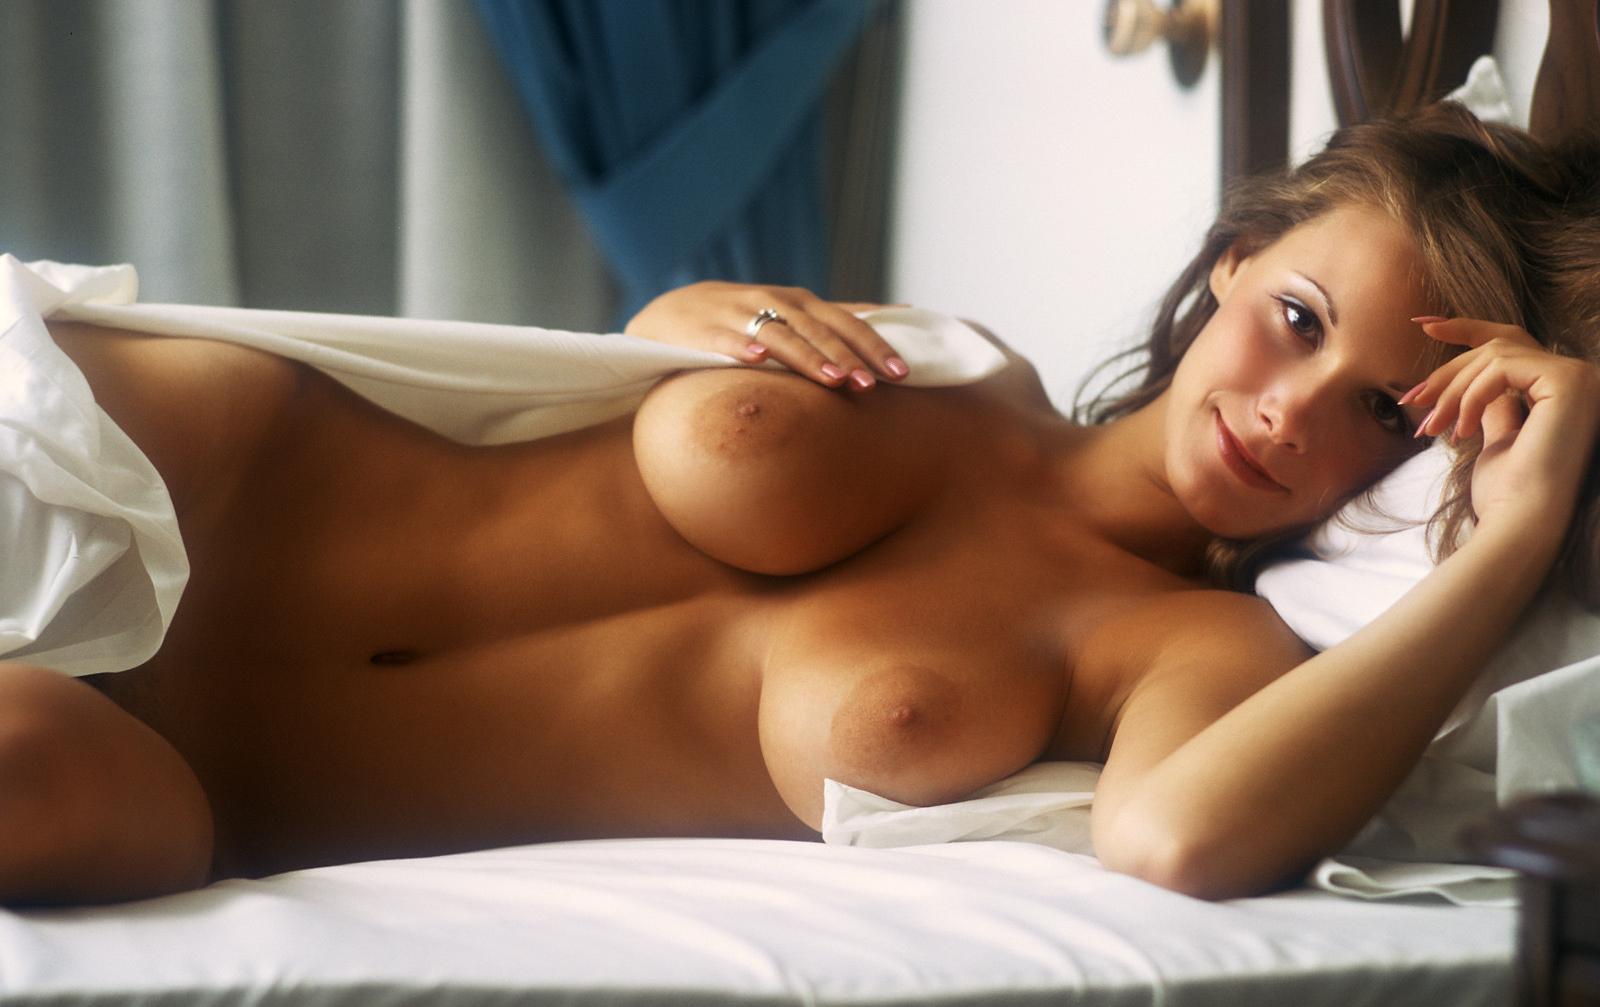 Nackt im Morining